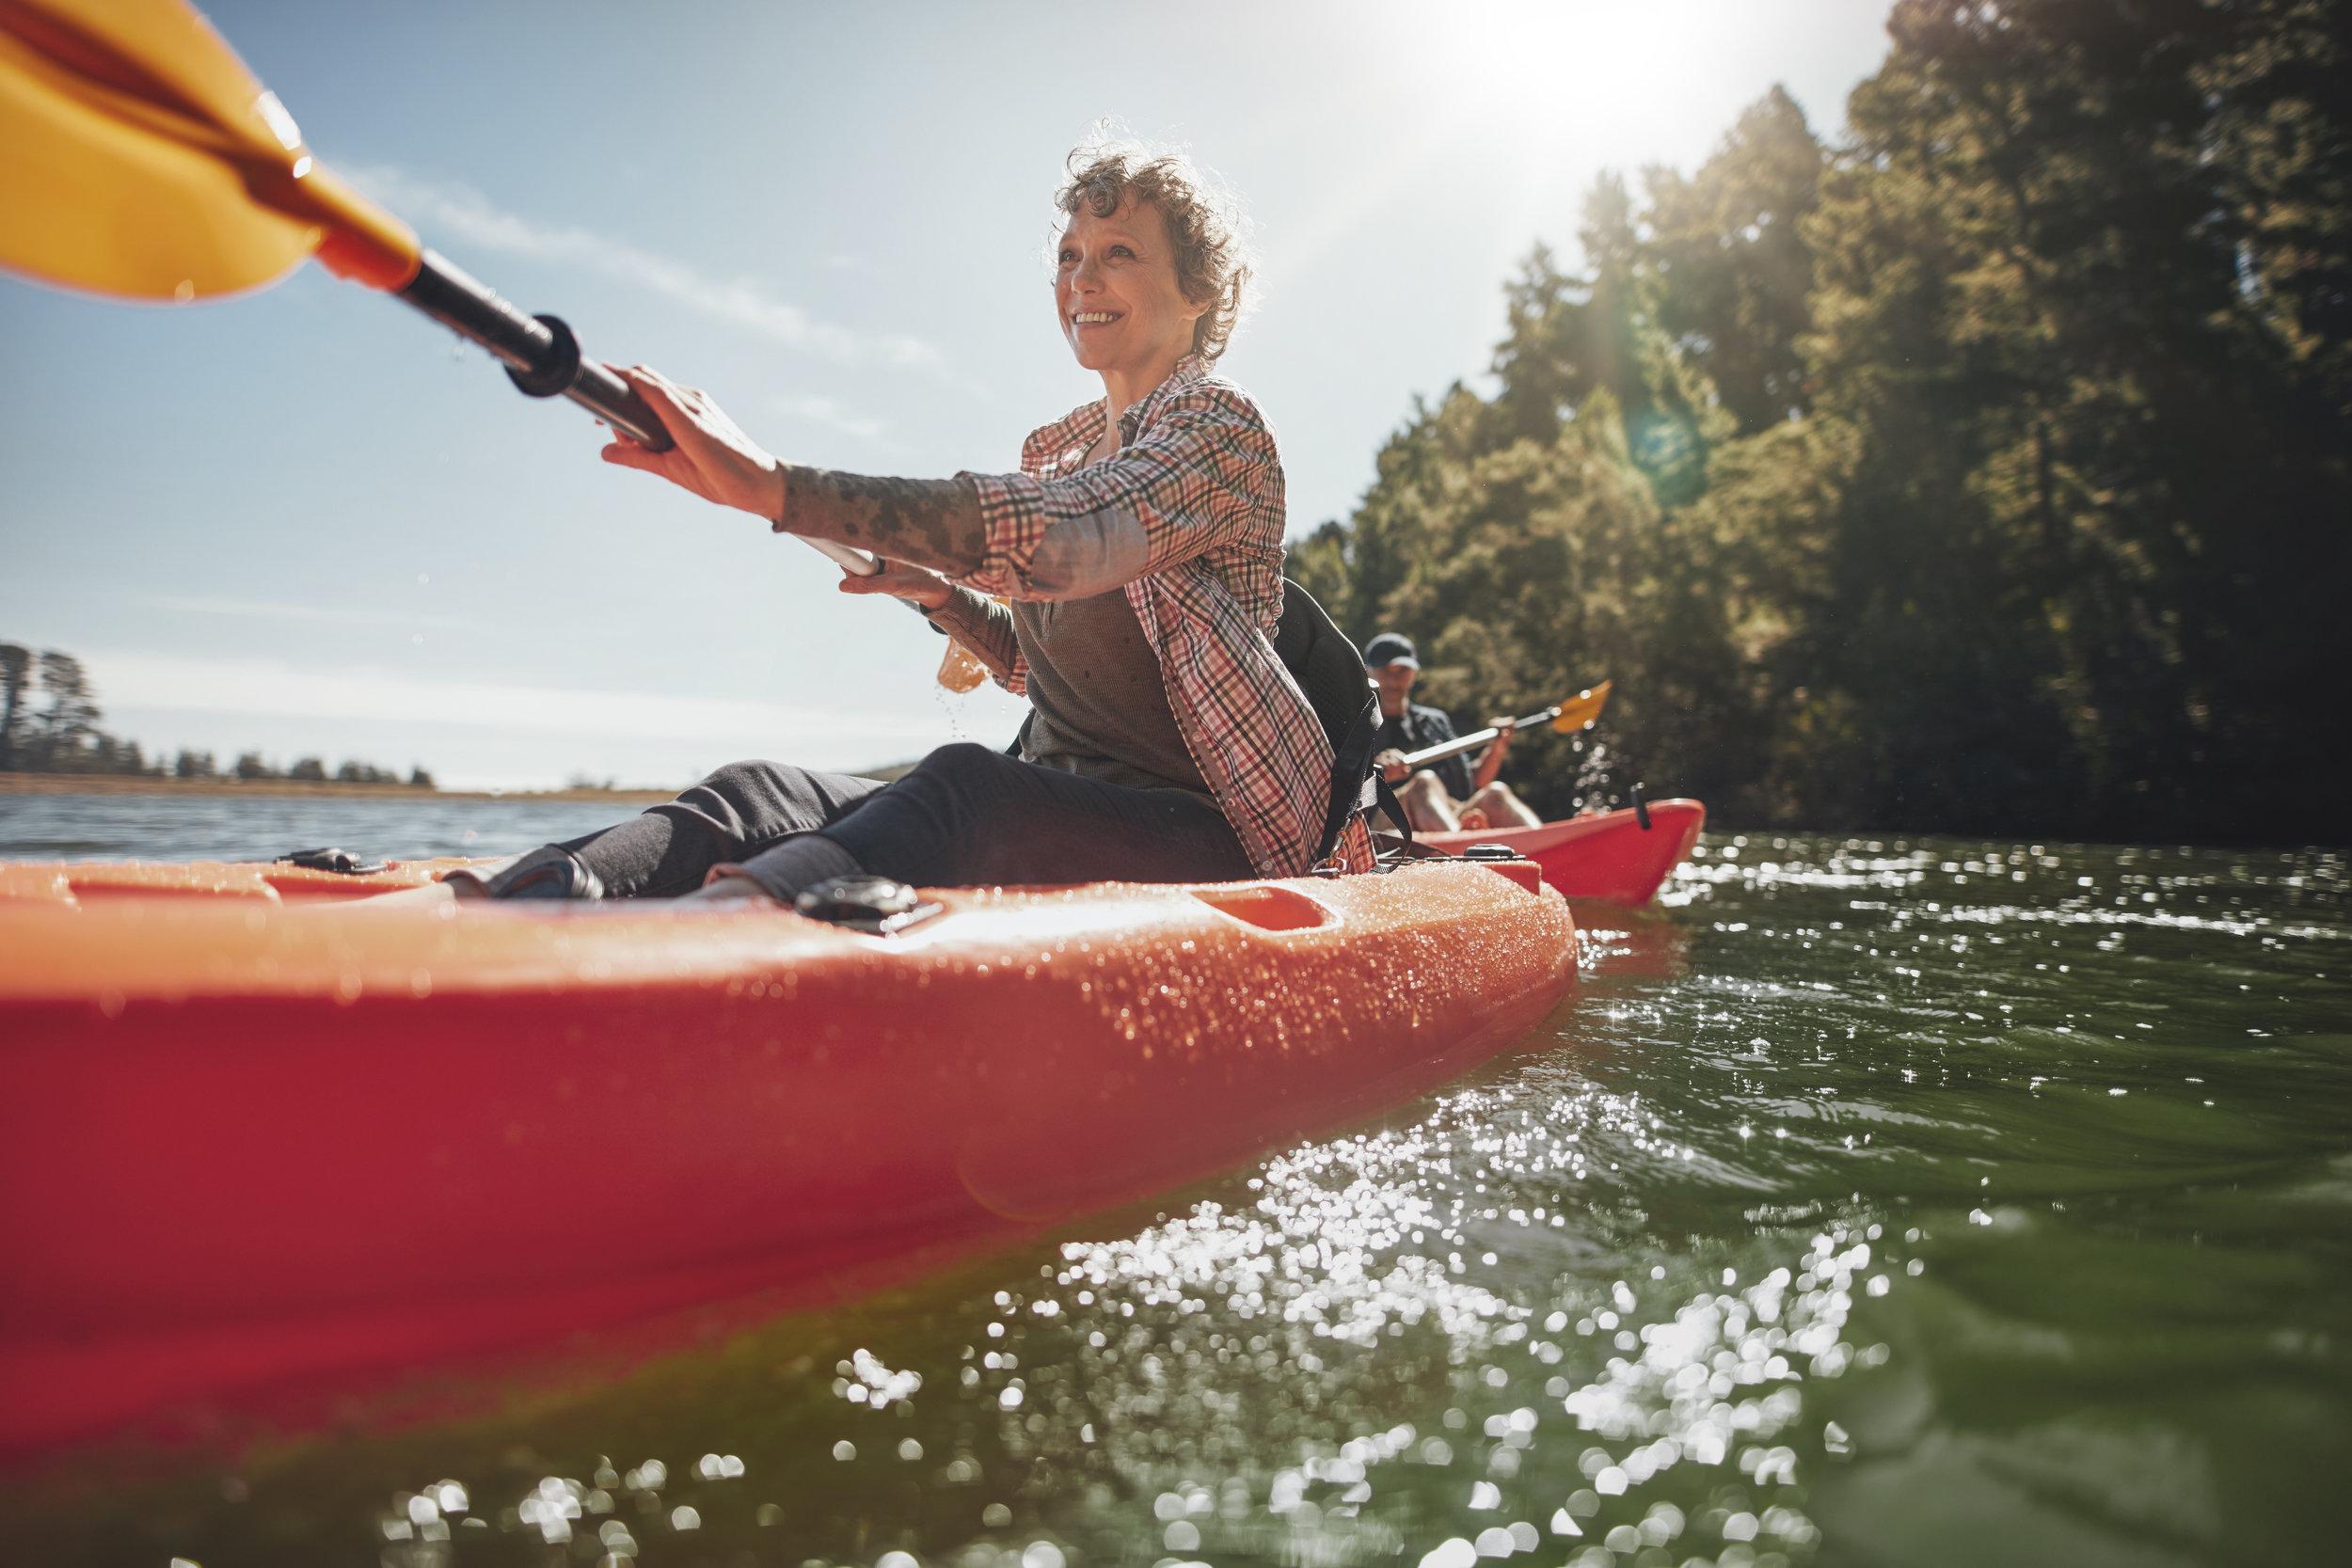 senior-woman-canoeing-in-lake-on-a-summer-day-PZJK7NM.jpg